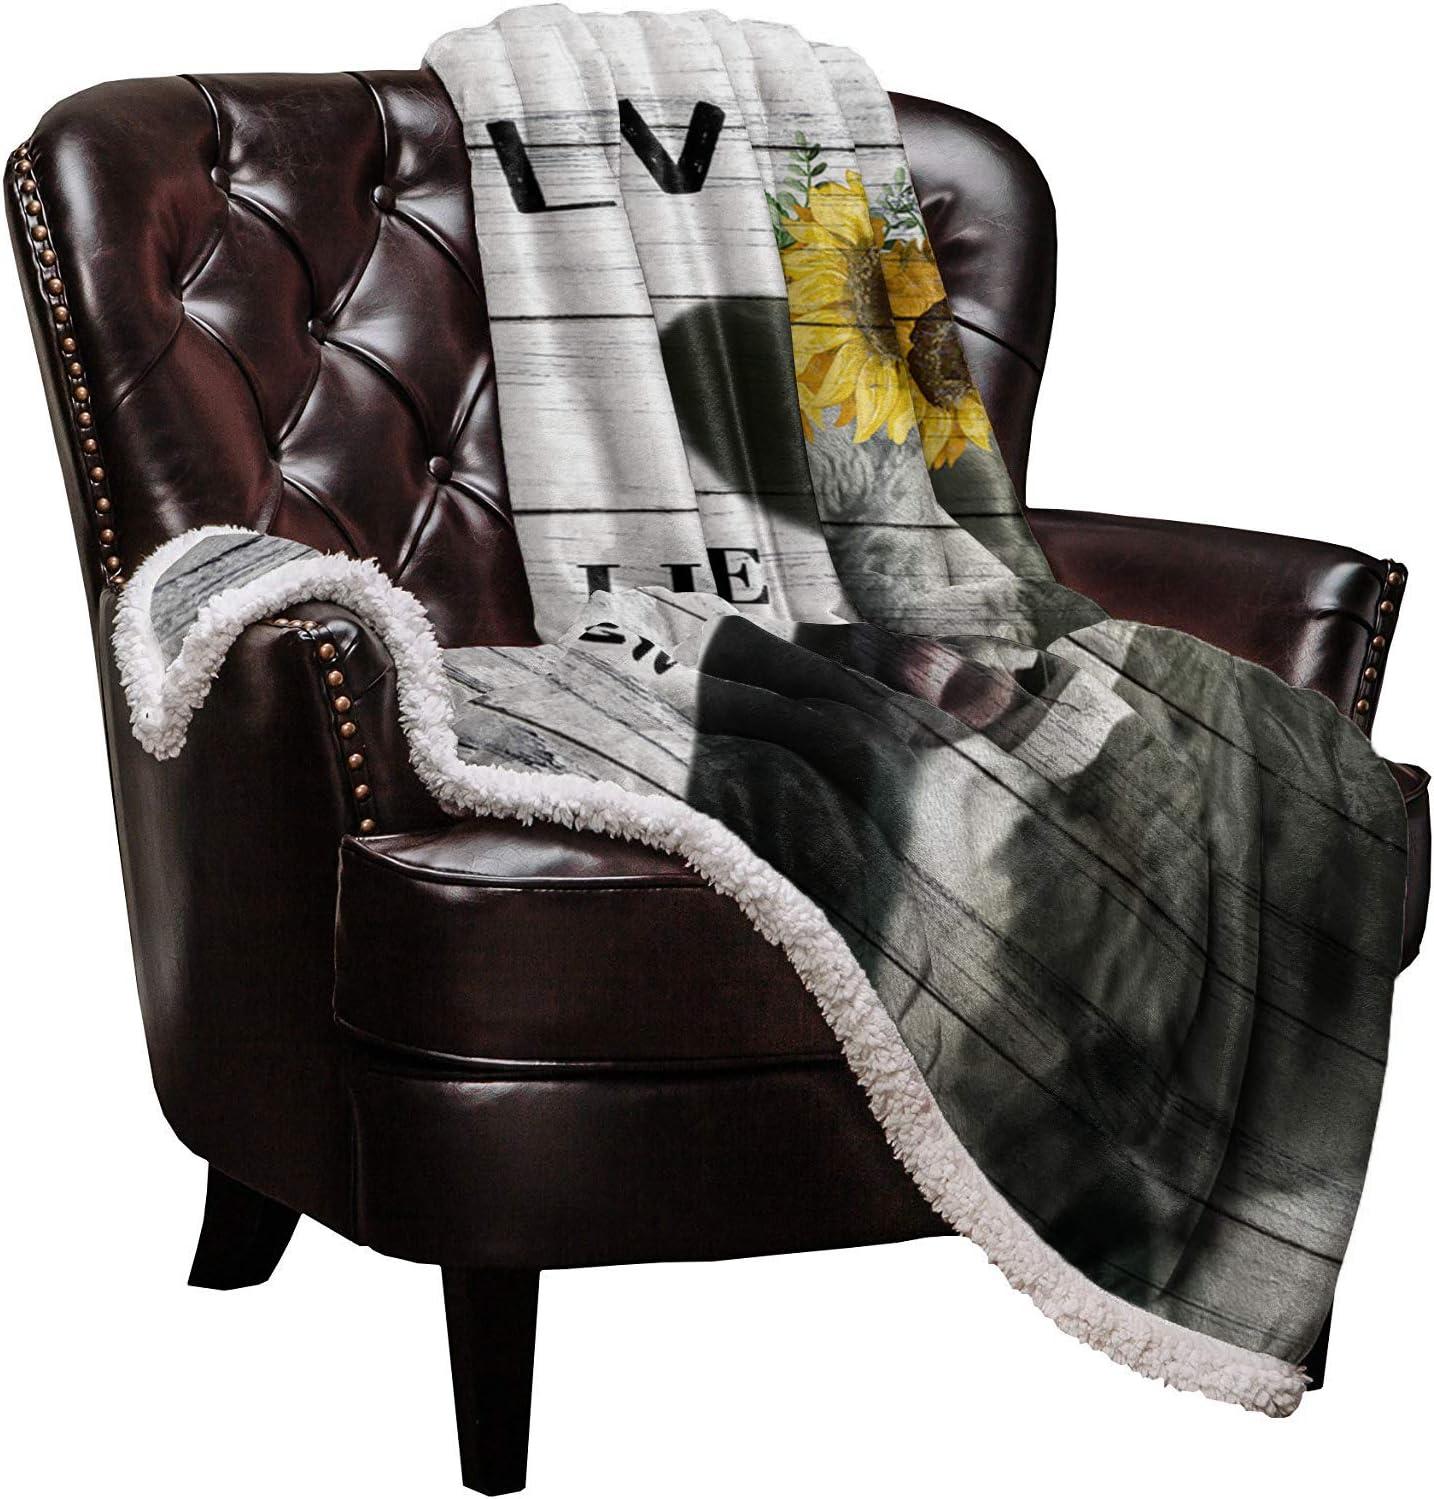 Max 68% OFF Max 88% OFF Sherpa Fleece Throw Blanket Smile Farmhou Cow Soft Warm Blankets